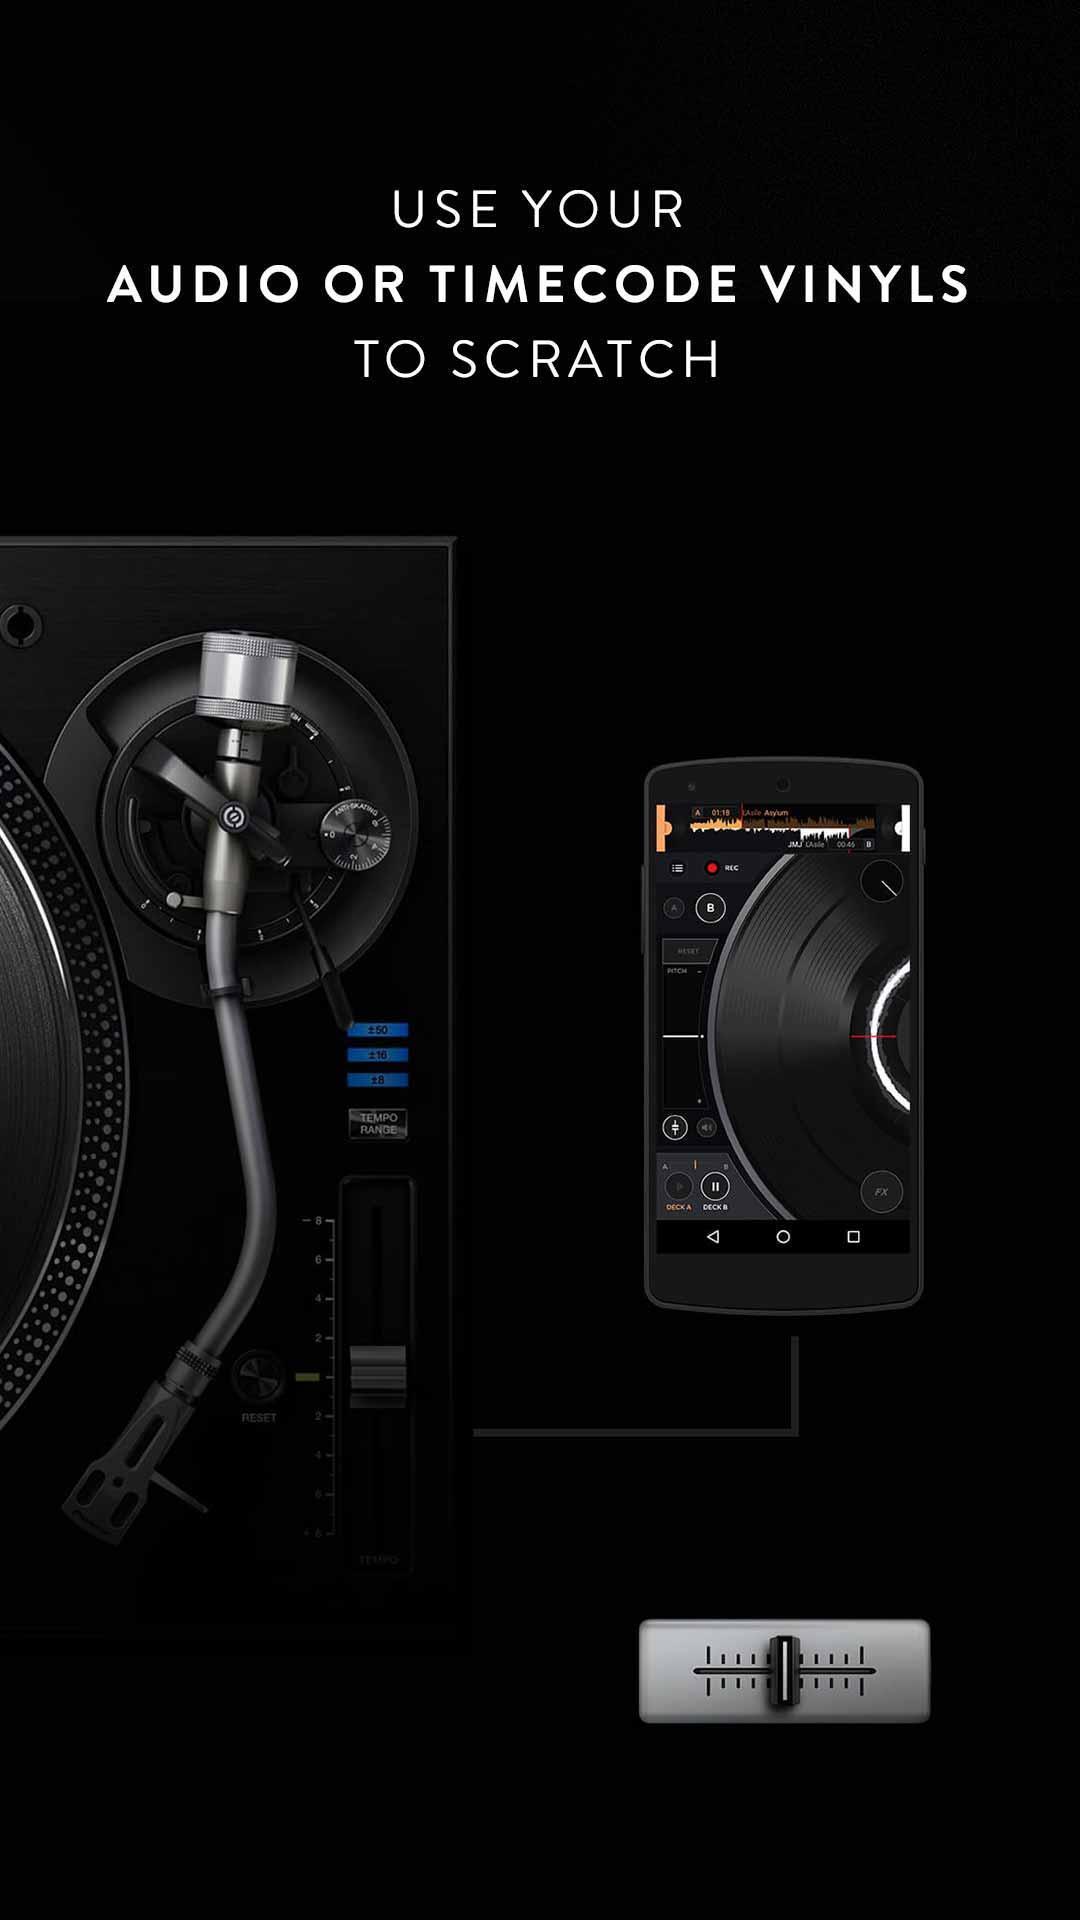 Mixfader dj digital vinyl 1.4.0 Screenshot 6